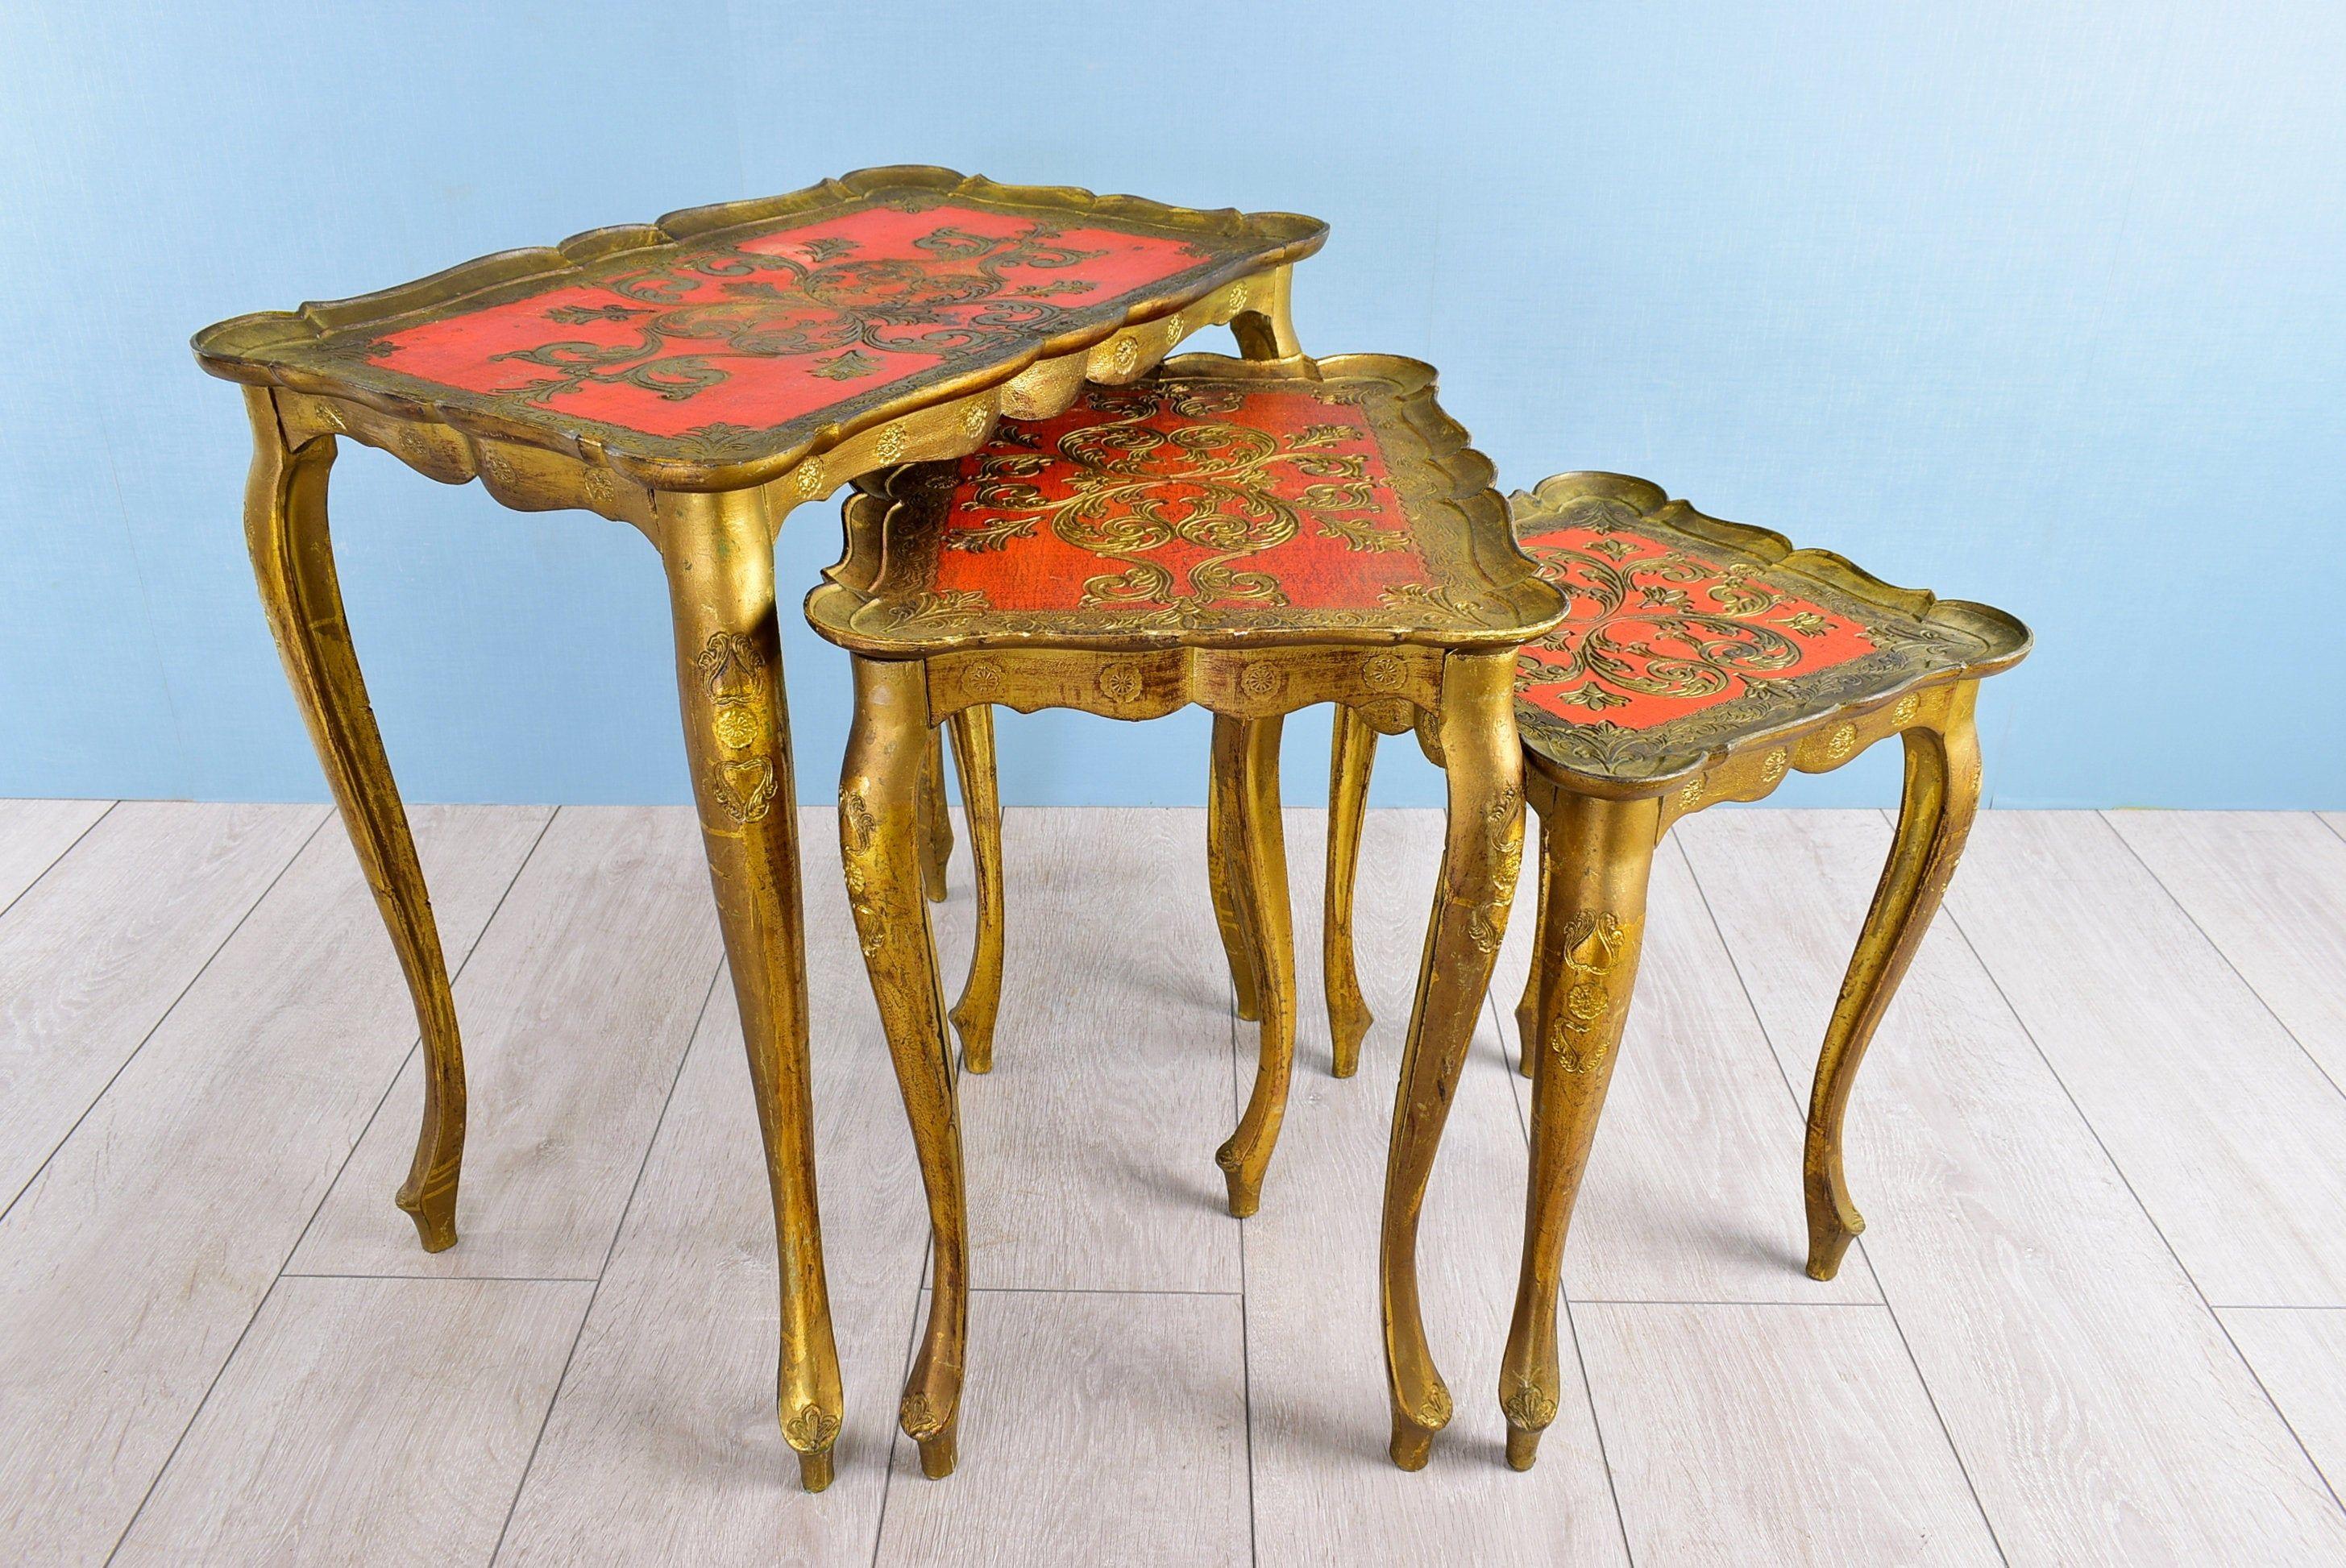 3 Vintage Bijzettafeltjes.Vintage Nesting Tables Florentine Country Style 3 Tier Set Side